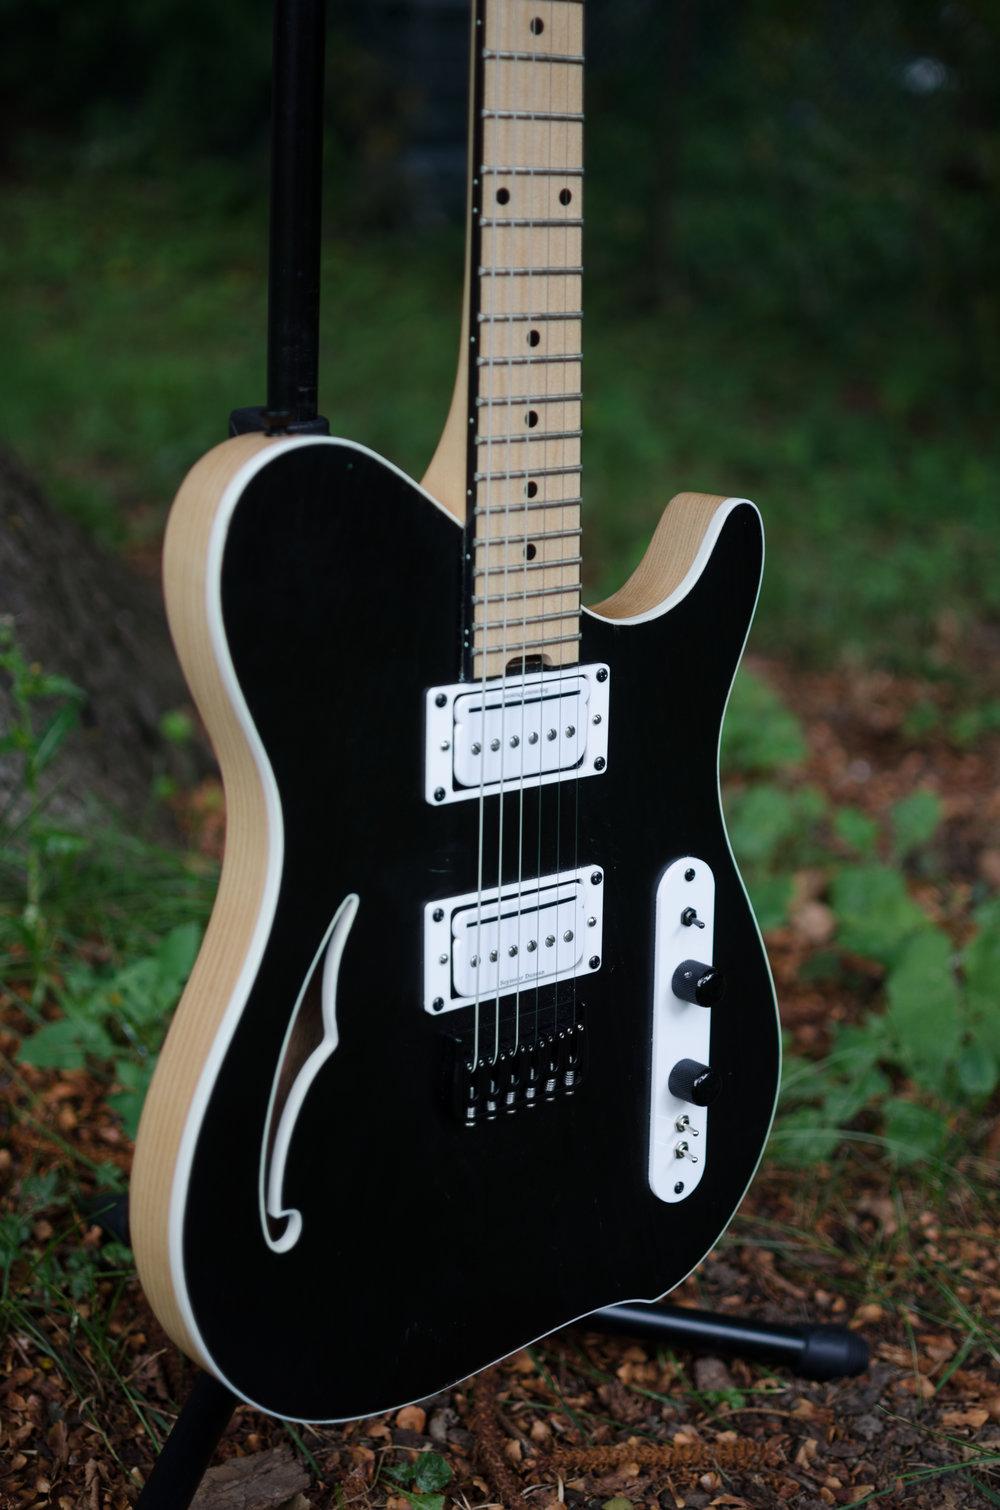 Guitar #002-3.jpg